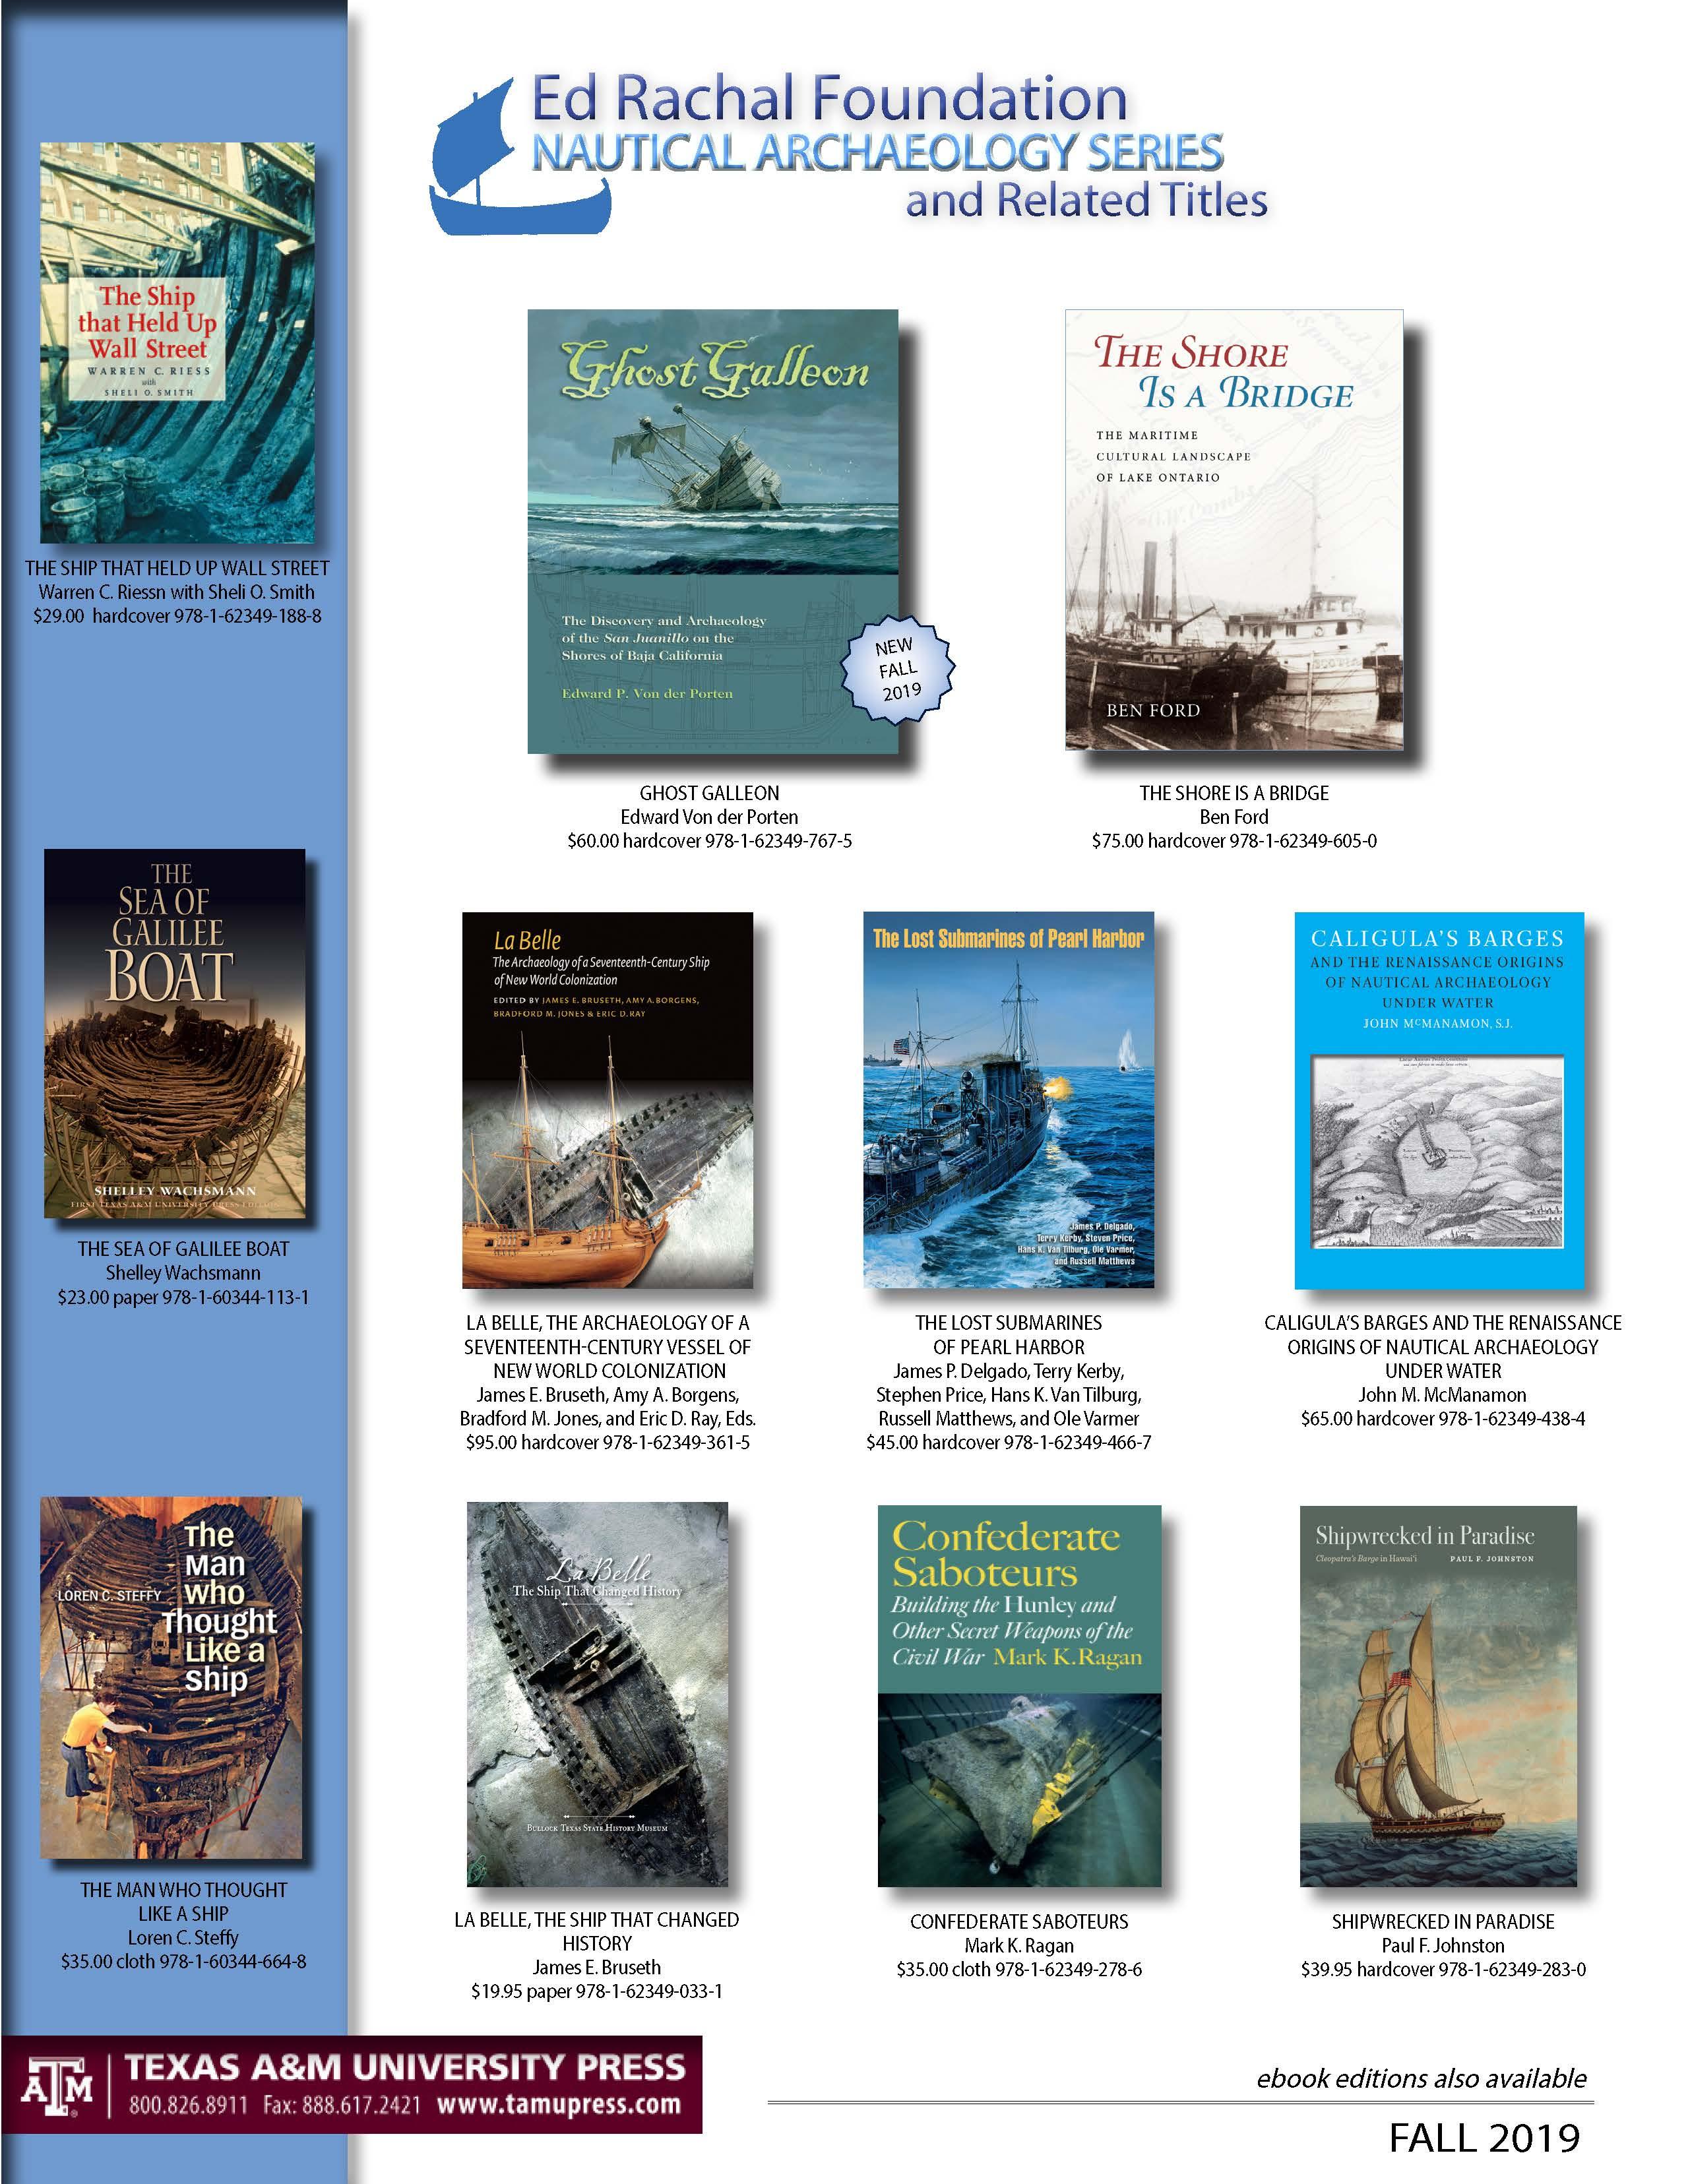 Nautical Archaeology